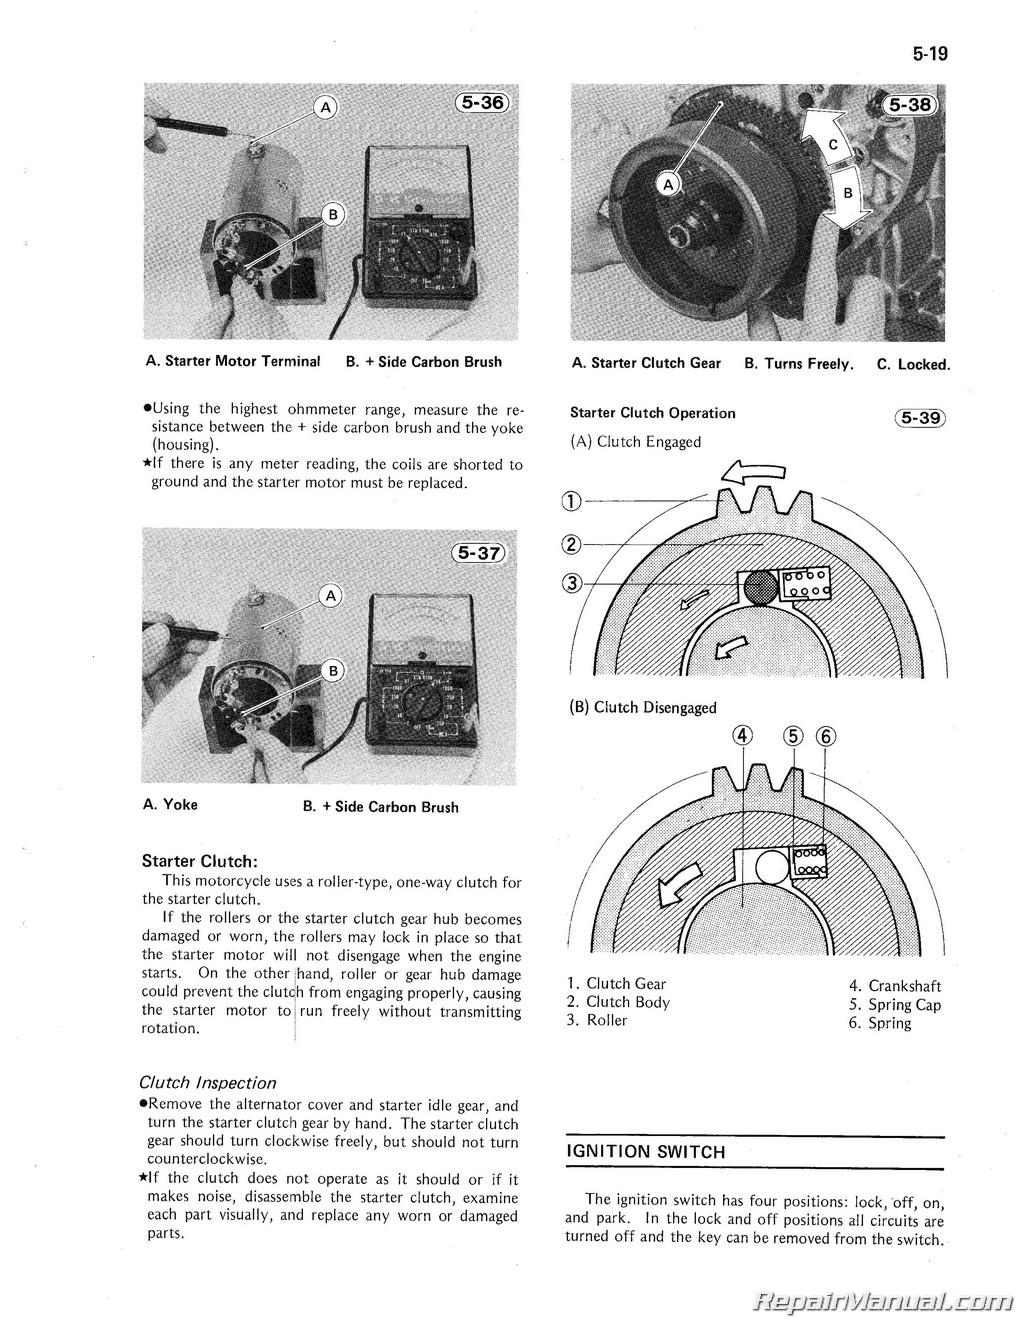 Kawasaki 1981-1983 KZ1100 1984-1985 ZN1100 Shaft Drive Motorcycle Service  Manual